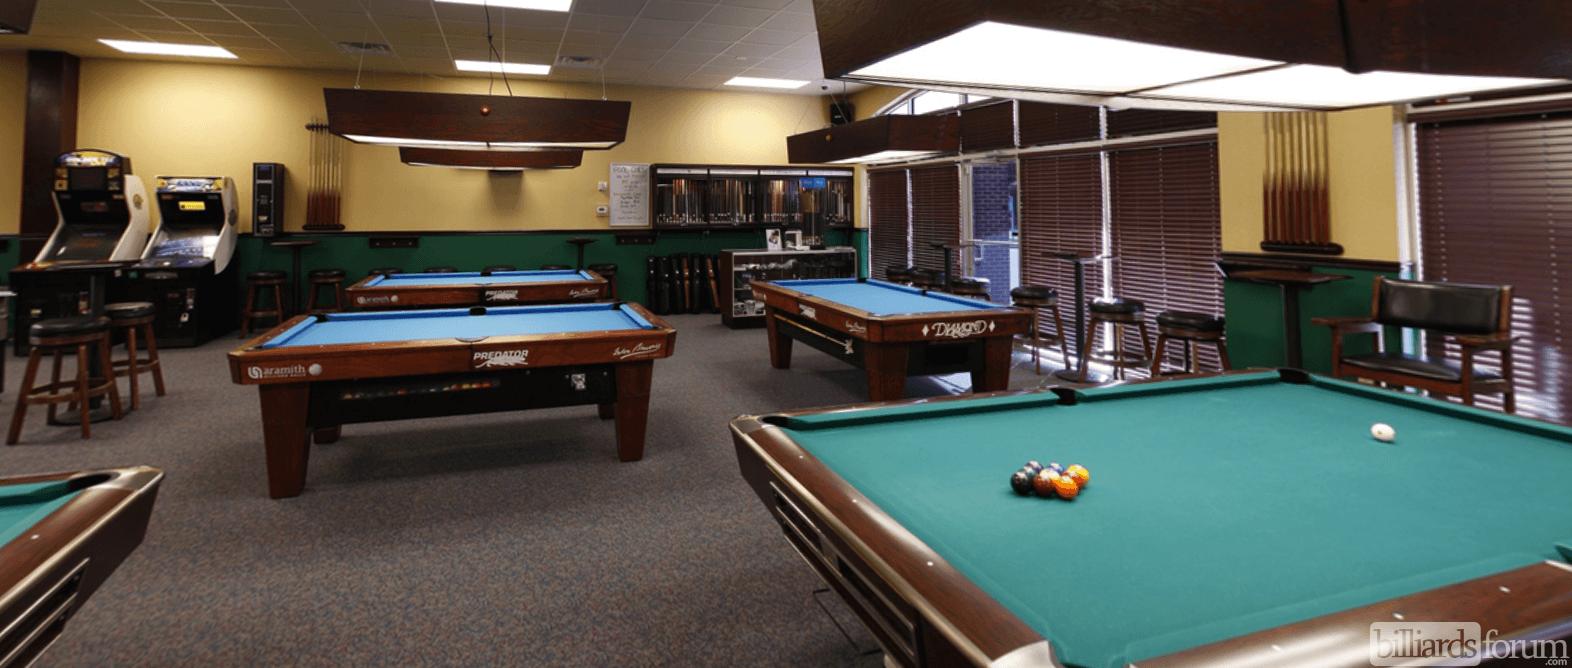 Pool Tables At Gate City Billiards Club Greensboro, NC